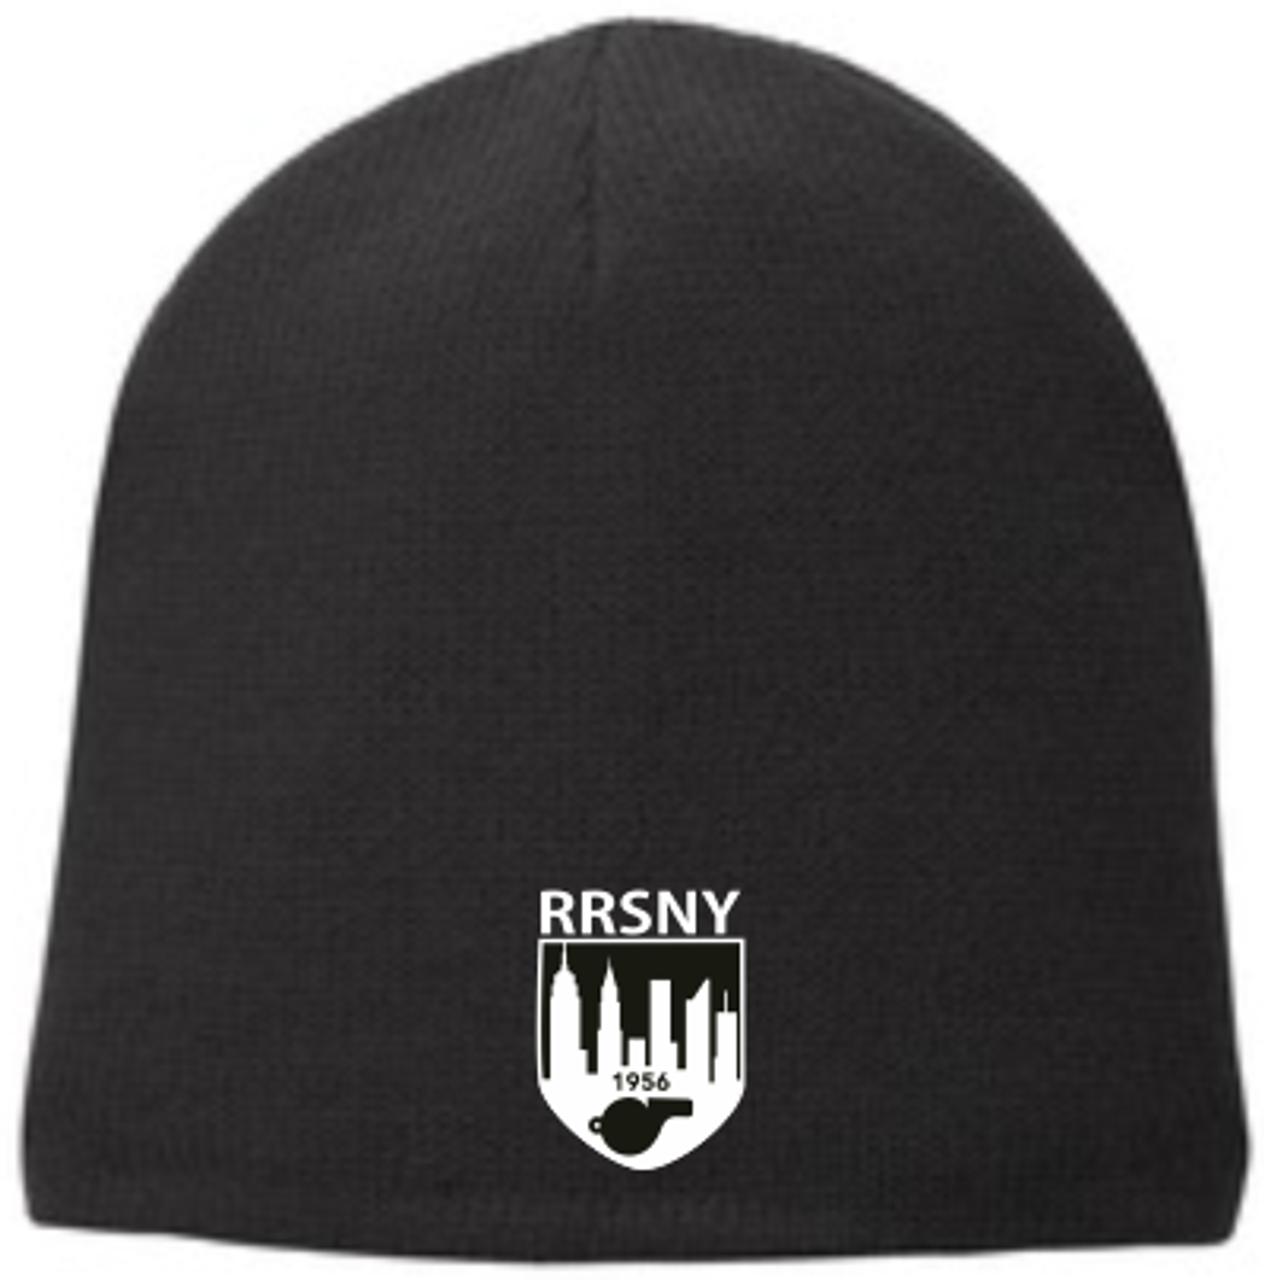 RRSNY Fleece-Lined Beanie, Black